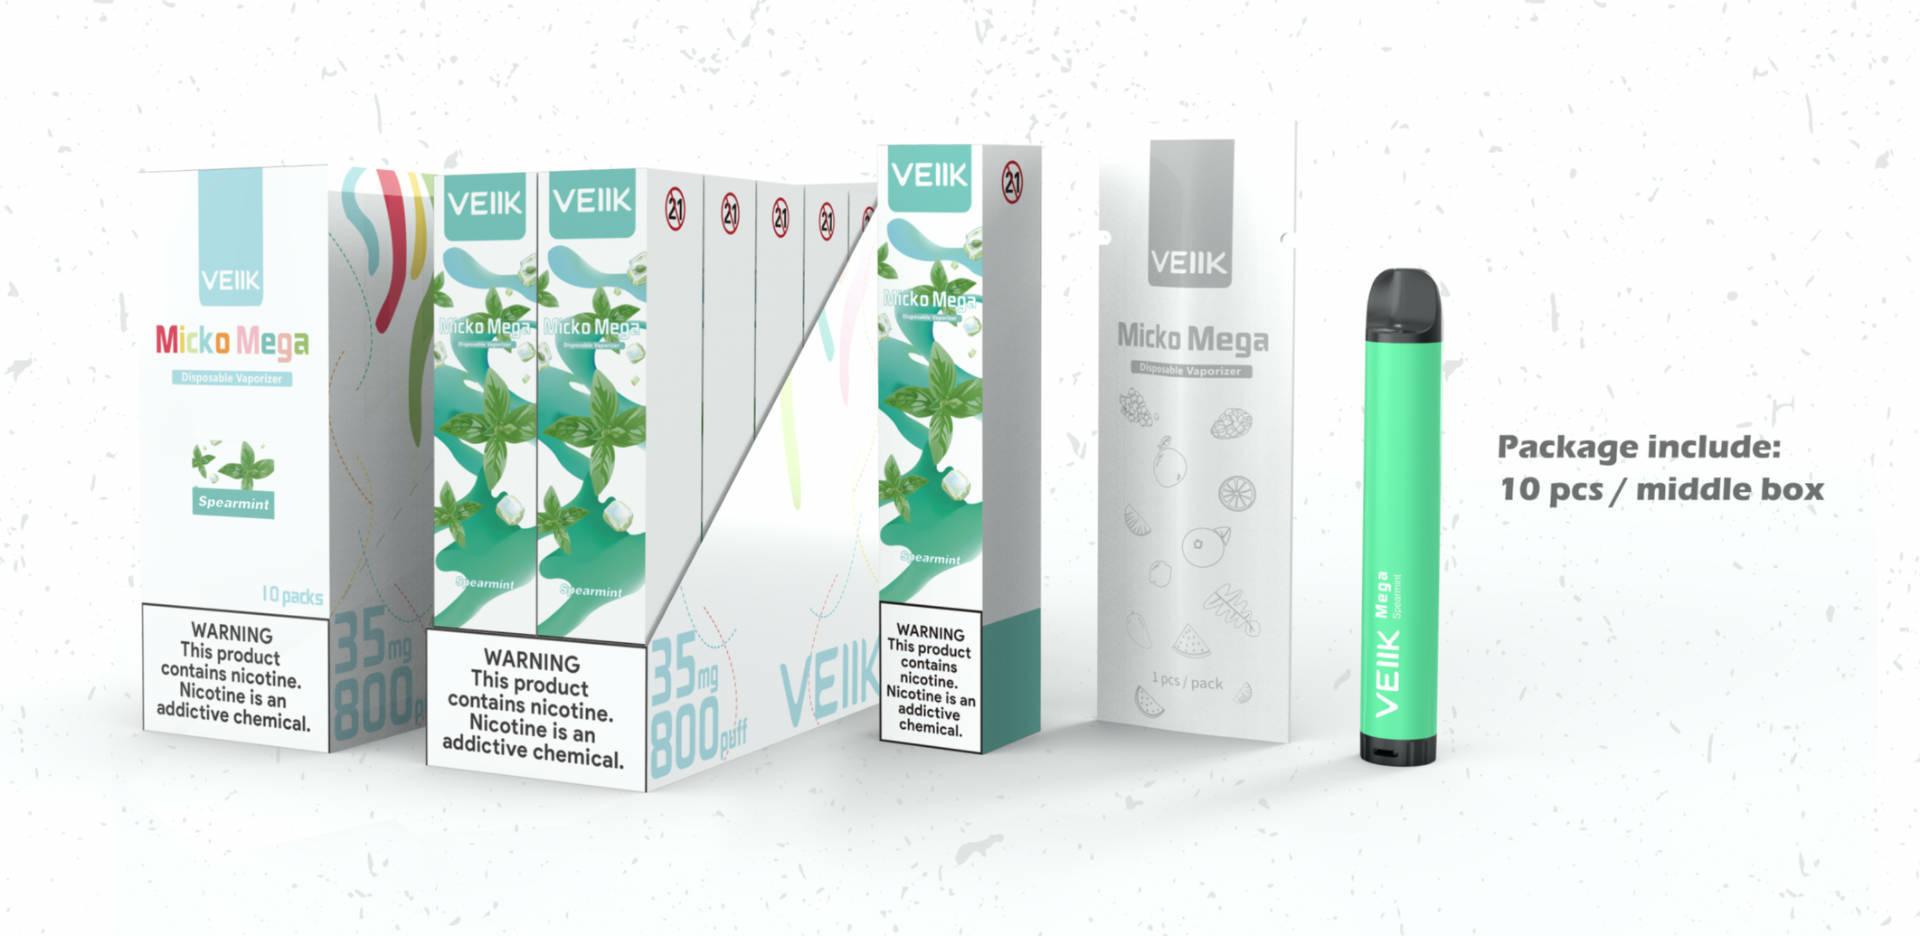 VEIIK vaping devices vendor for e cig market